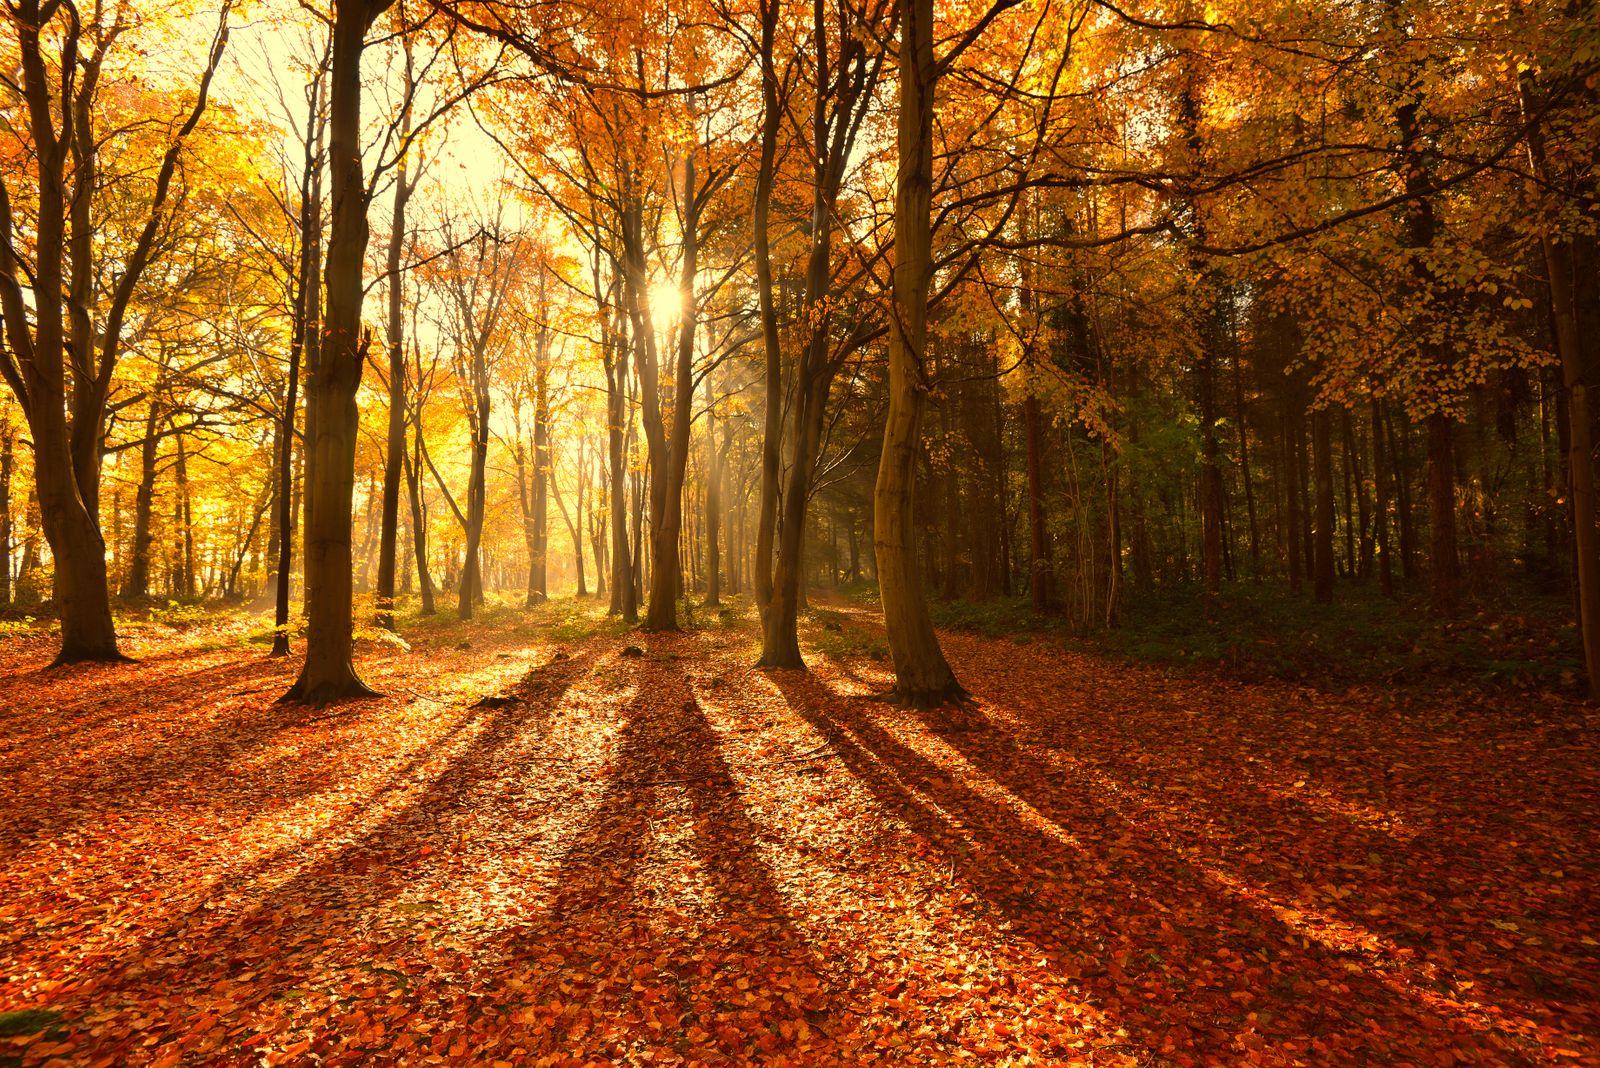 Sunlight through autumn tree's with long shadows